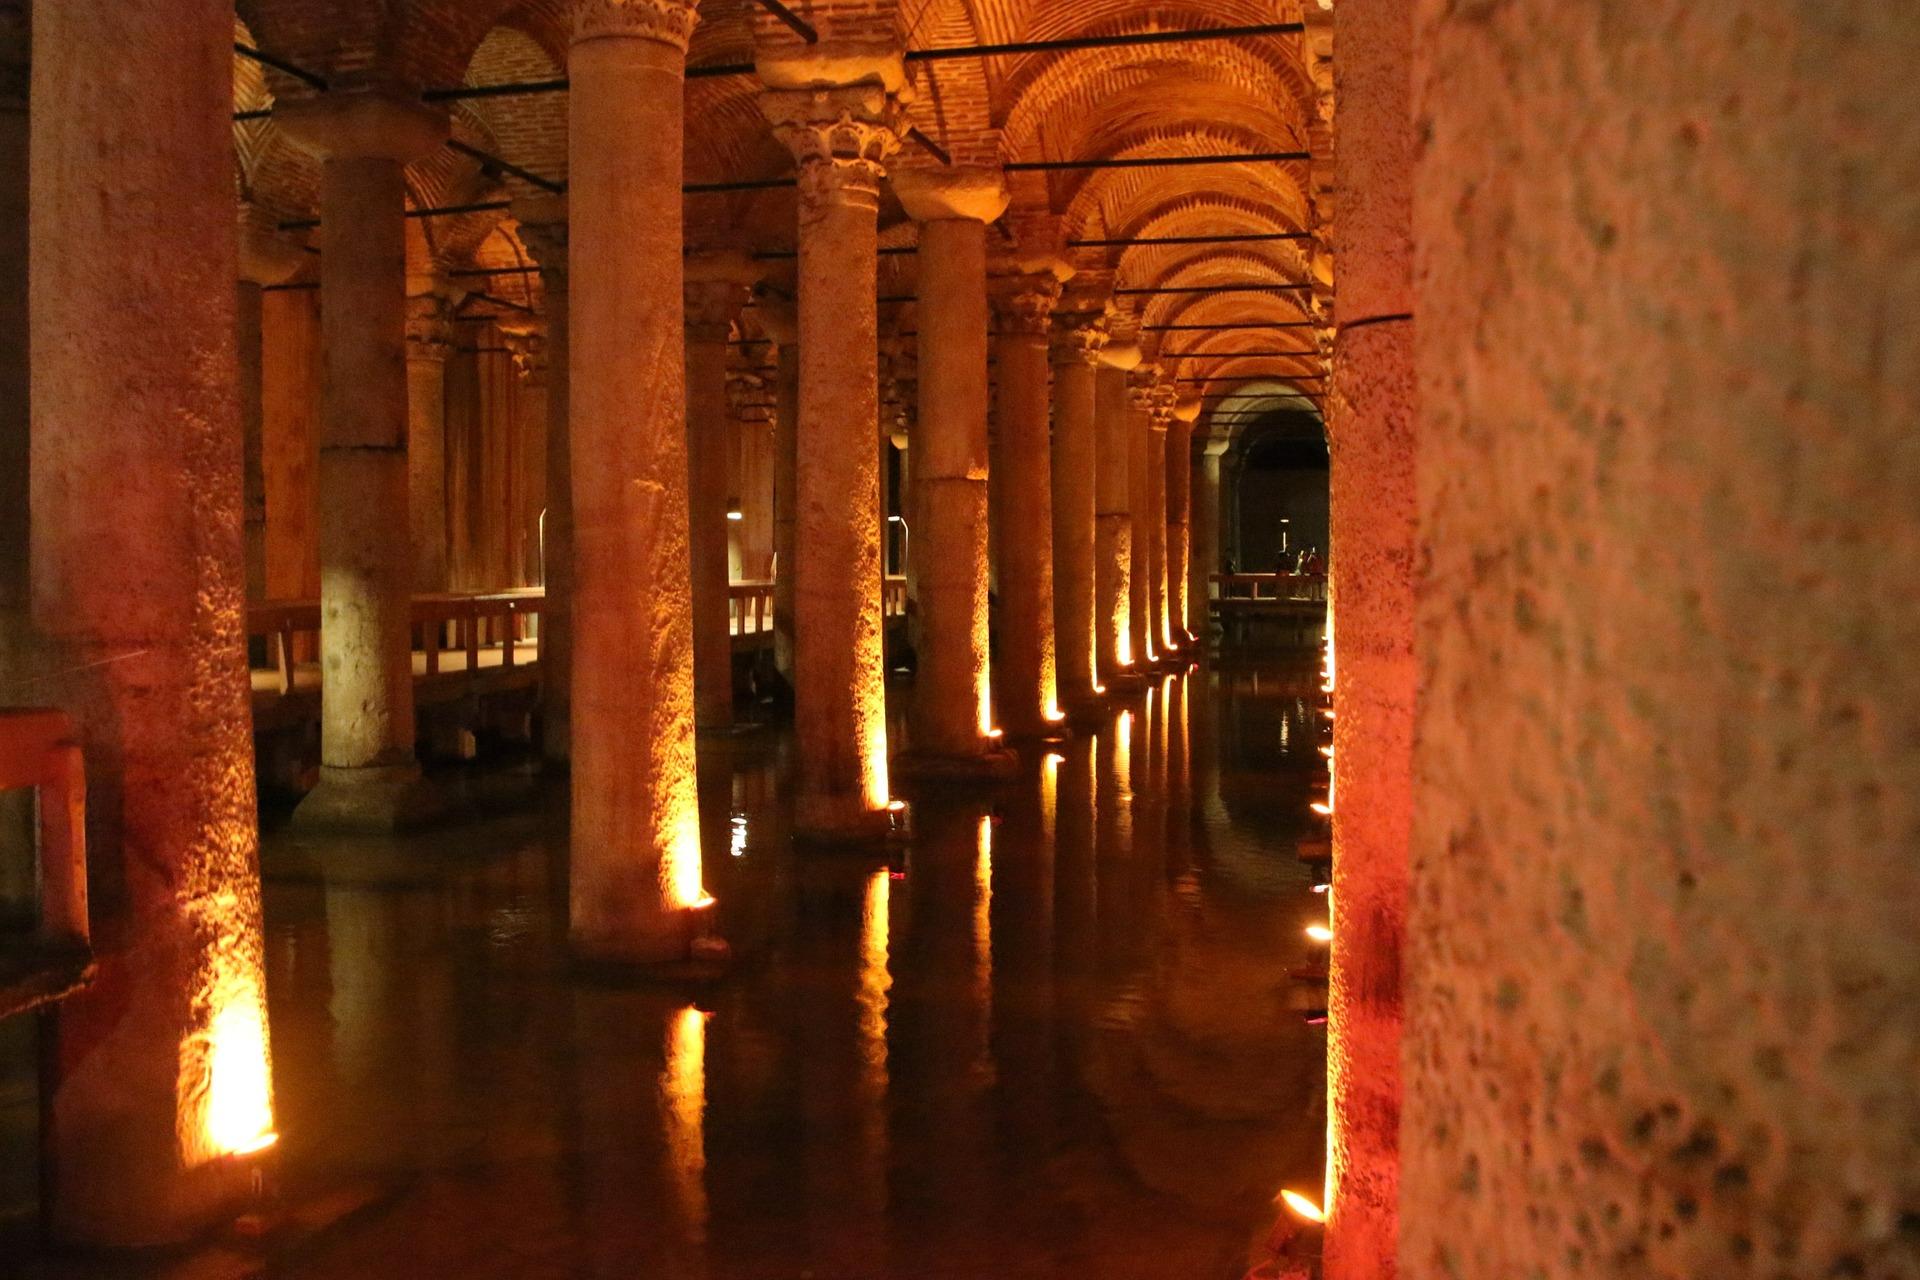 Basilica Cistern (a.k.a. the Sunken Palace), Istanbul, Turkey